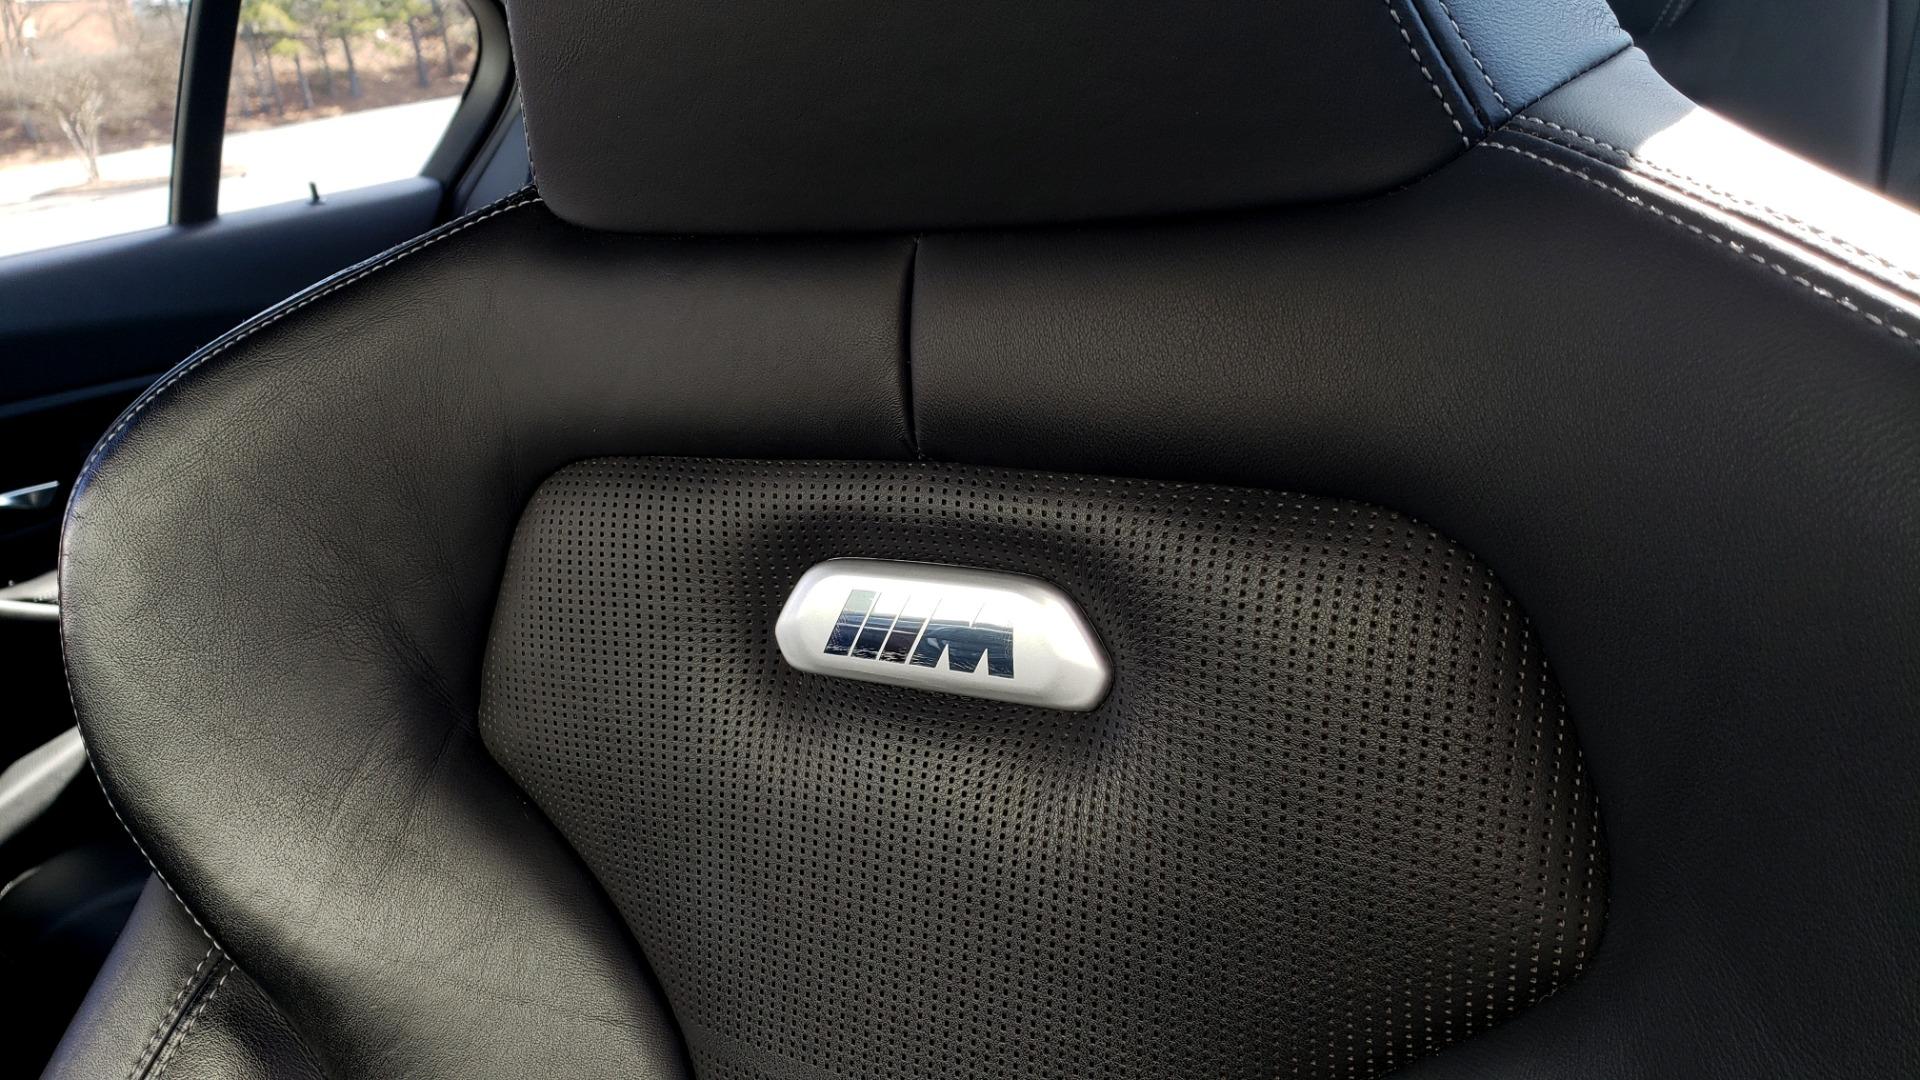 Used 2016 BMW M3 SEDAN / EXECUTIVE PKG / M-SUSPENSION / HARMAN/KARDON SOUND for sale Sold at Formula Imports in Charlotte NC 28227 41